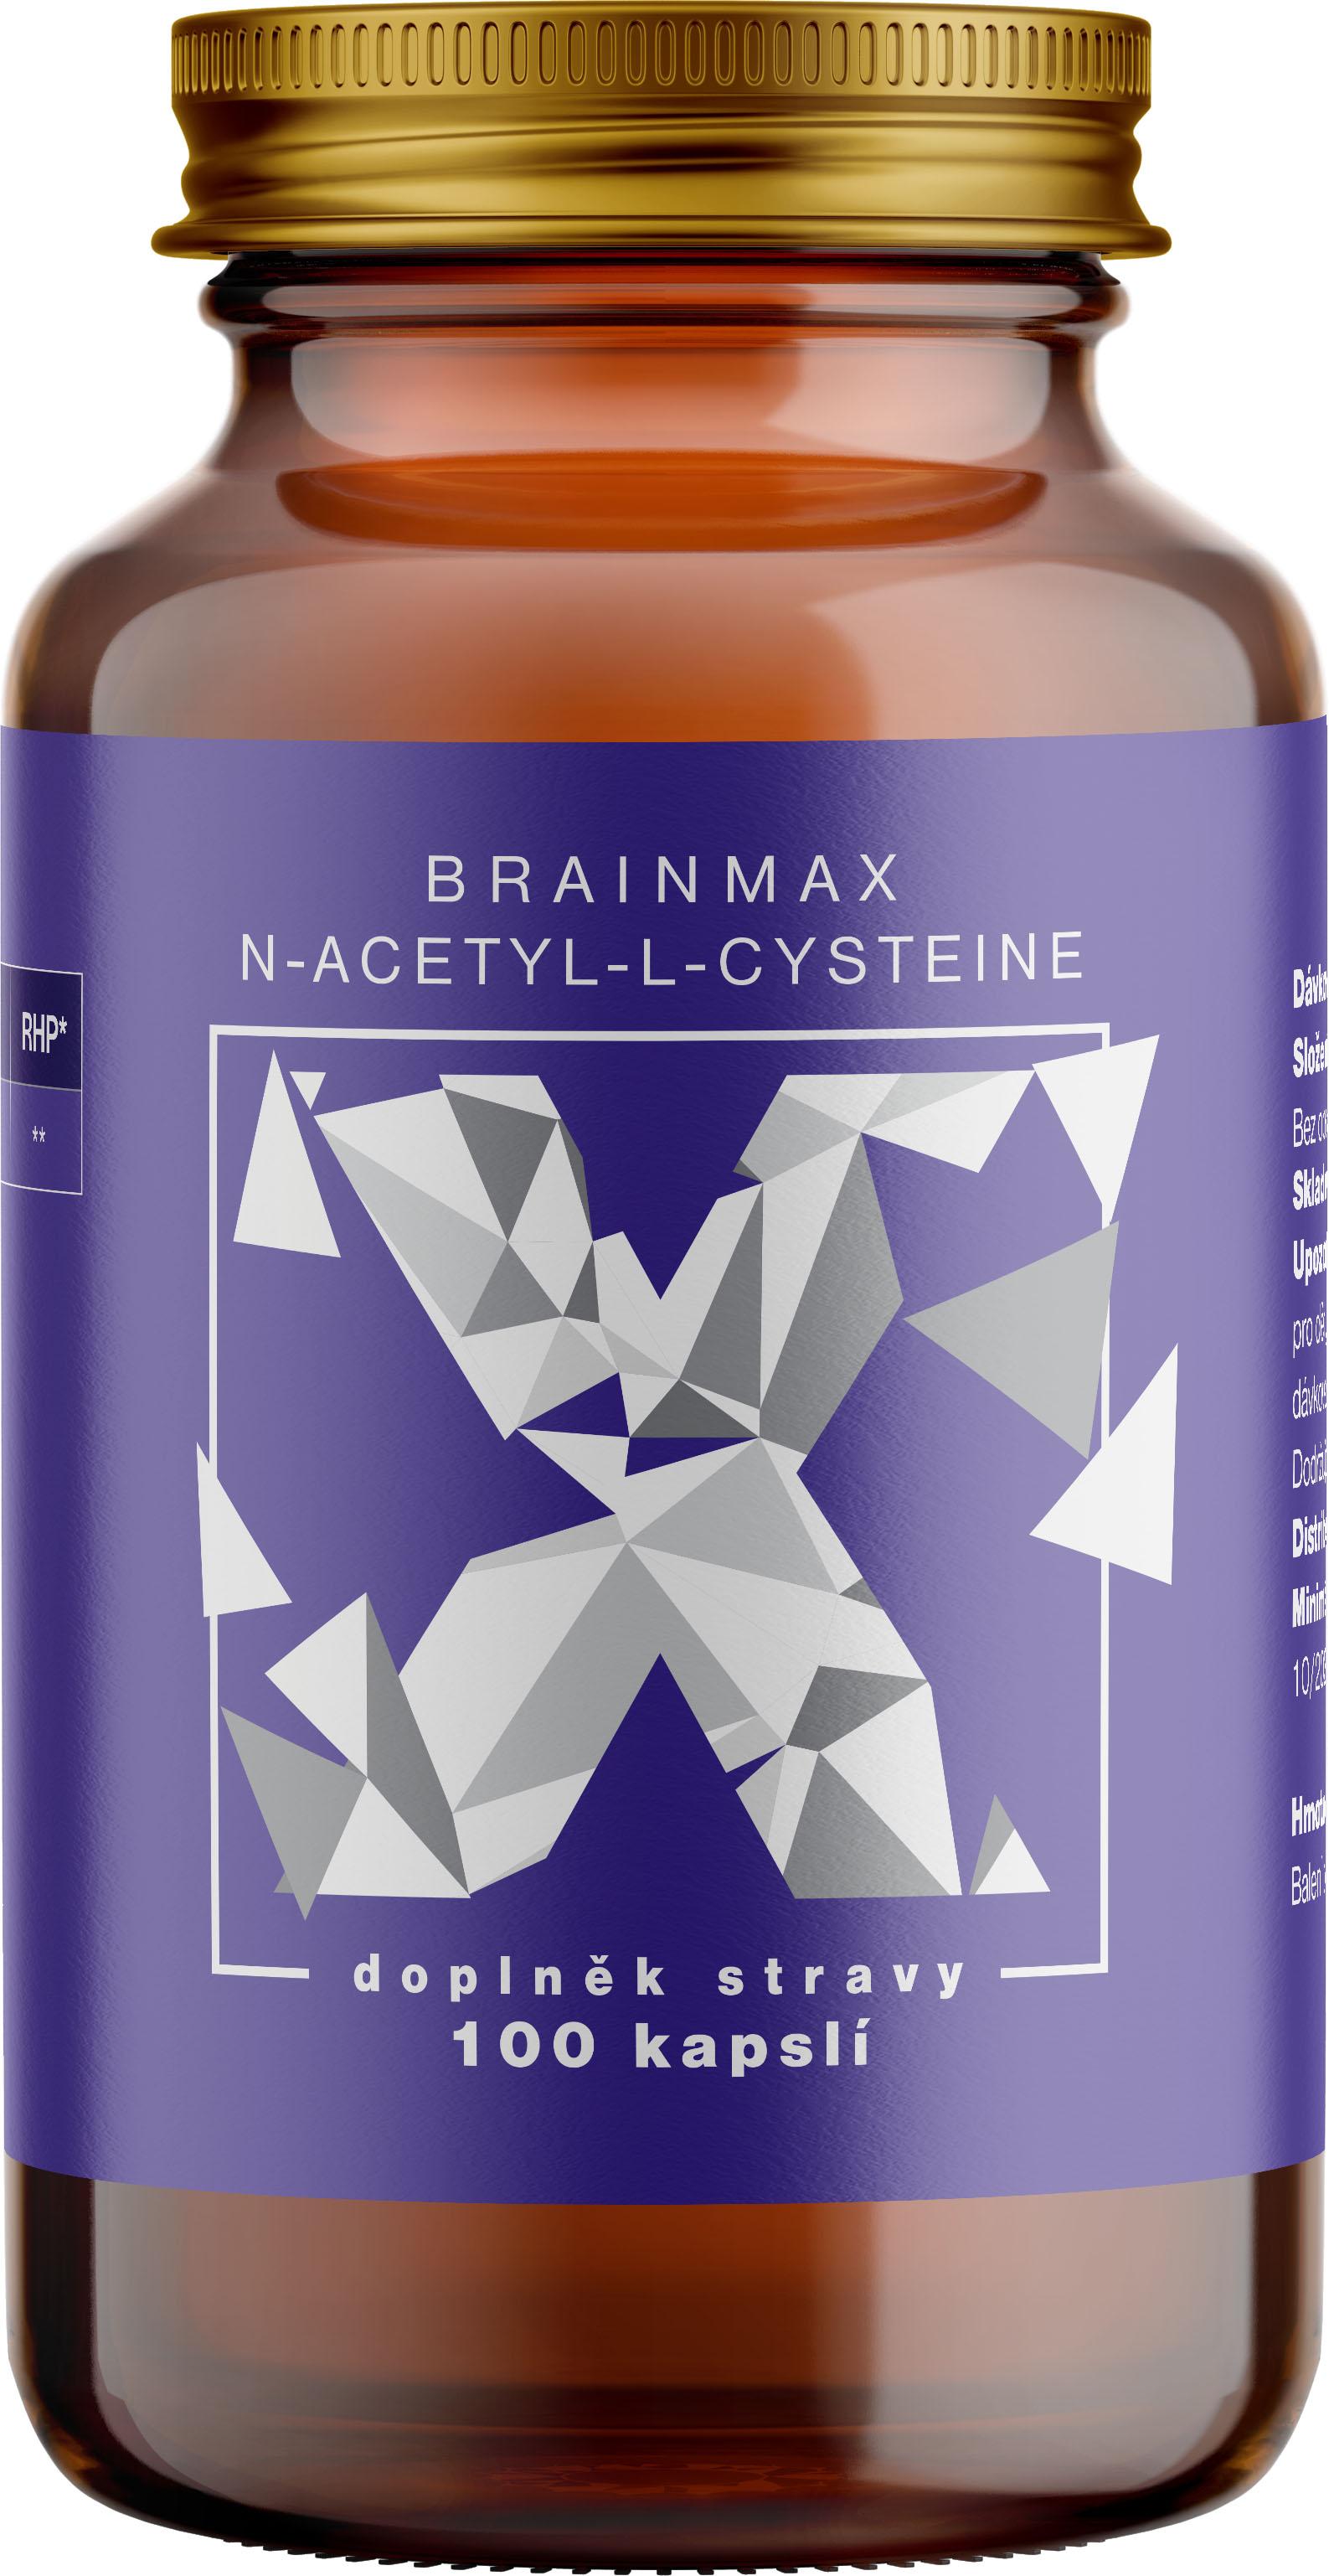 BrainMax N-Acetyl-L-Cysteine, NAC, 950 mg, 100 rastlinných kapsúl